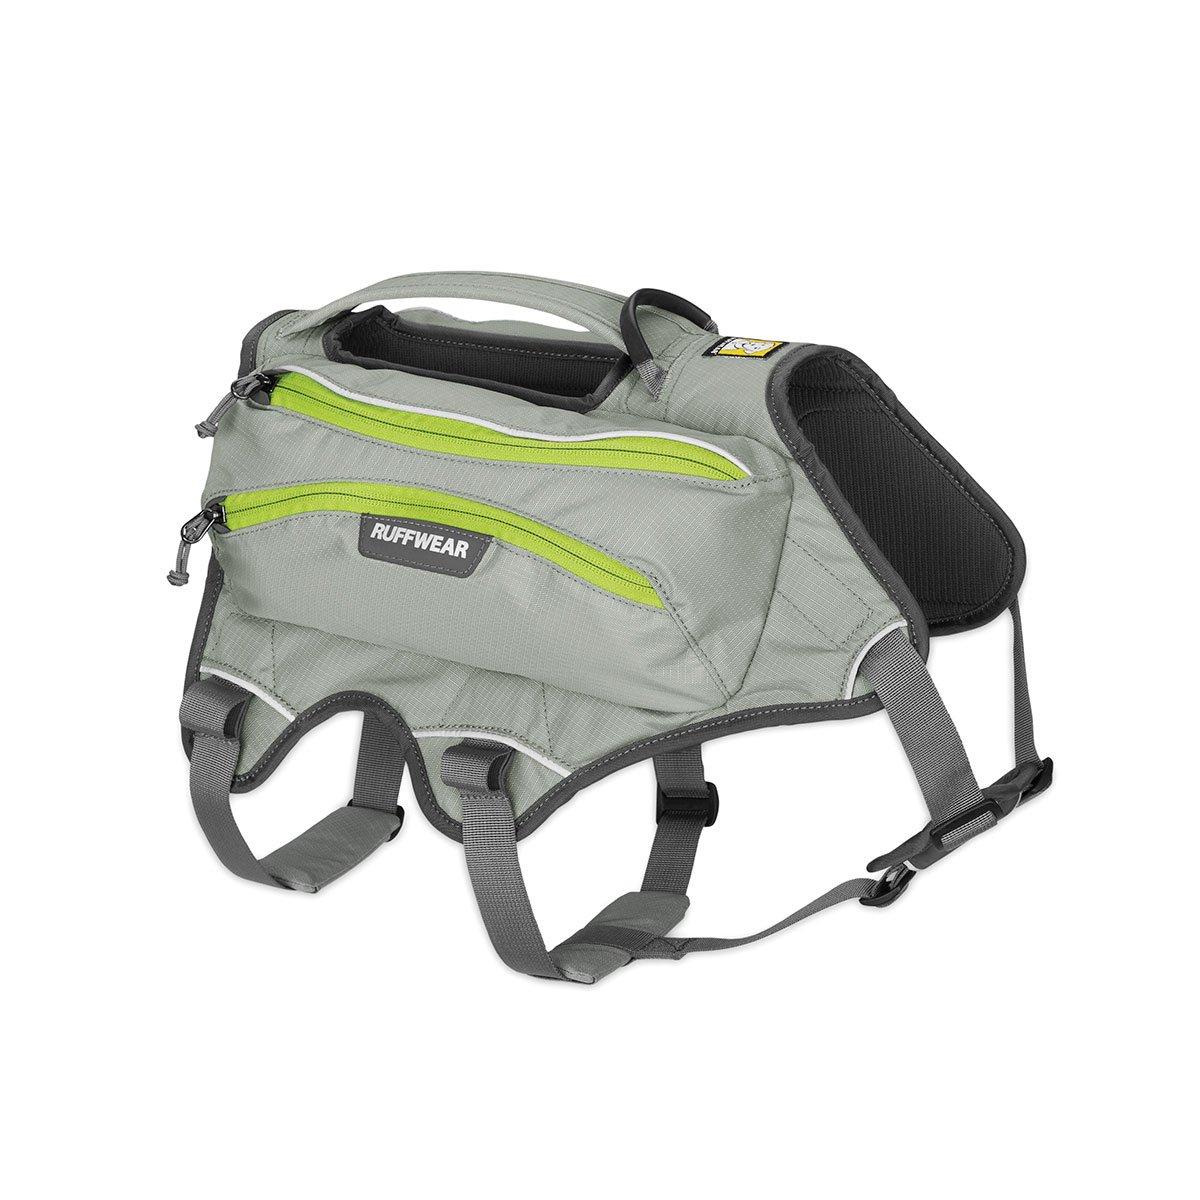 RUFFFWEAR Ruffwear - Singletrak Low-Profile Hydration Pack for Dogs, Cloudburst Gray, Large/X-Large